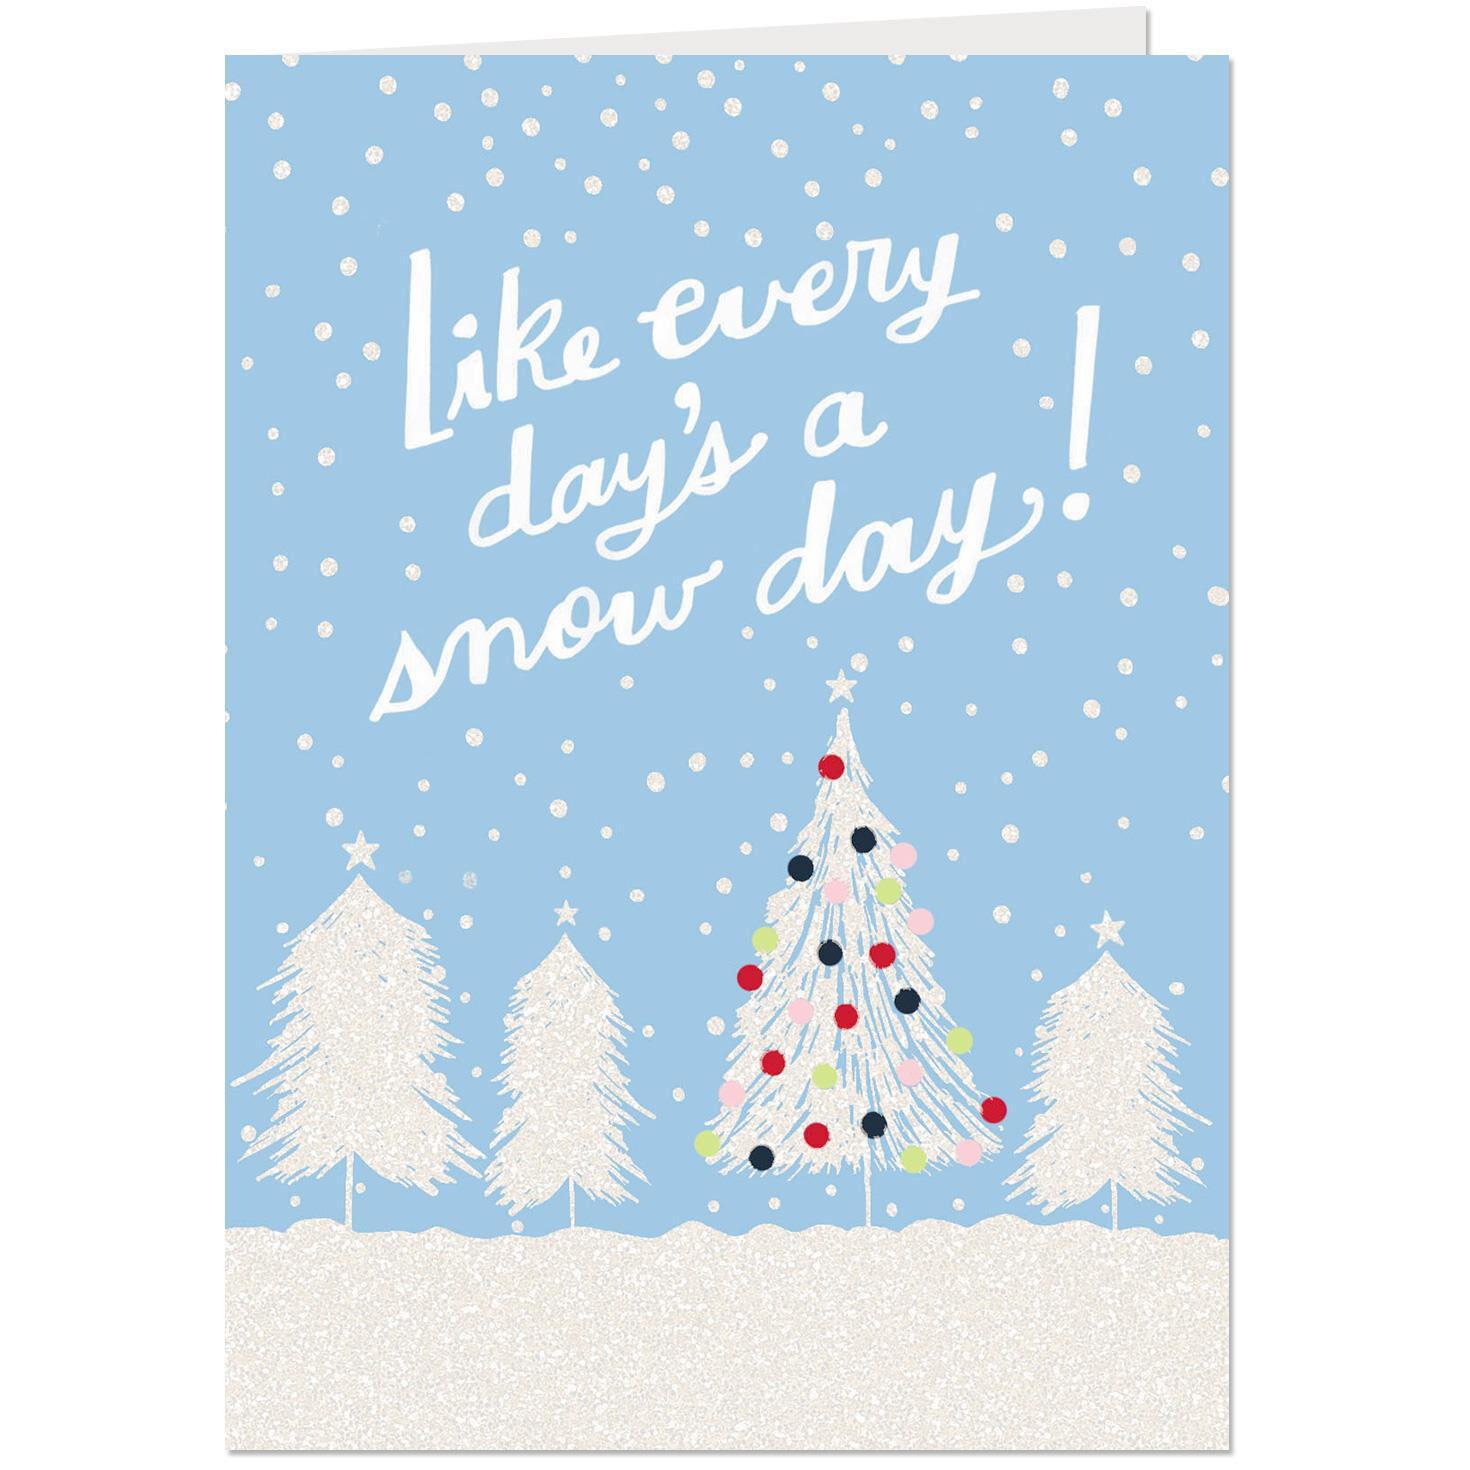 Wishing You A Season Of Merry Christmas Card Greeting Cards Hallmark